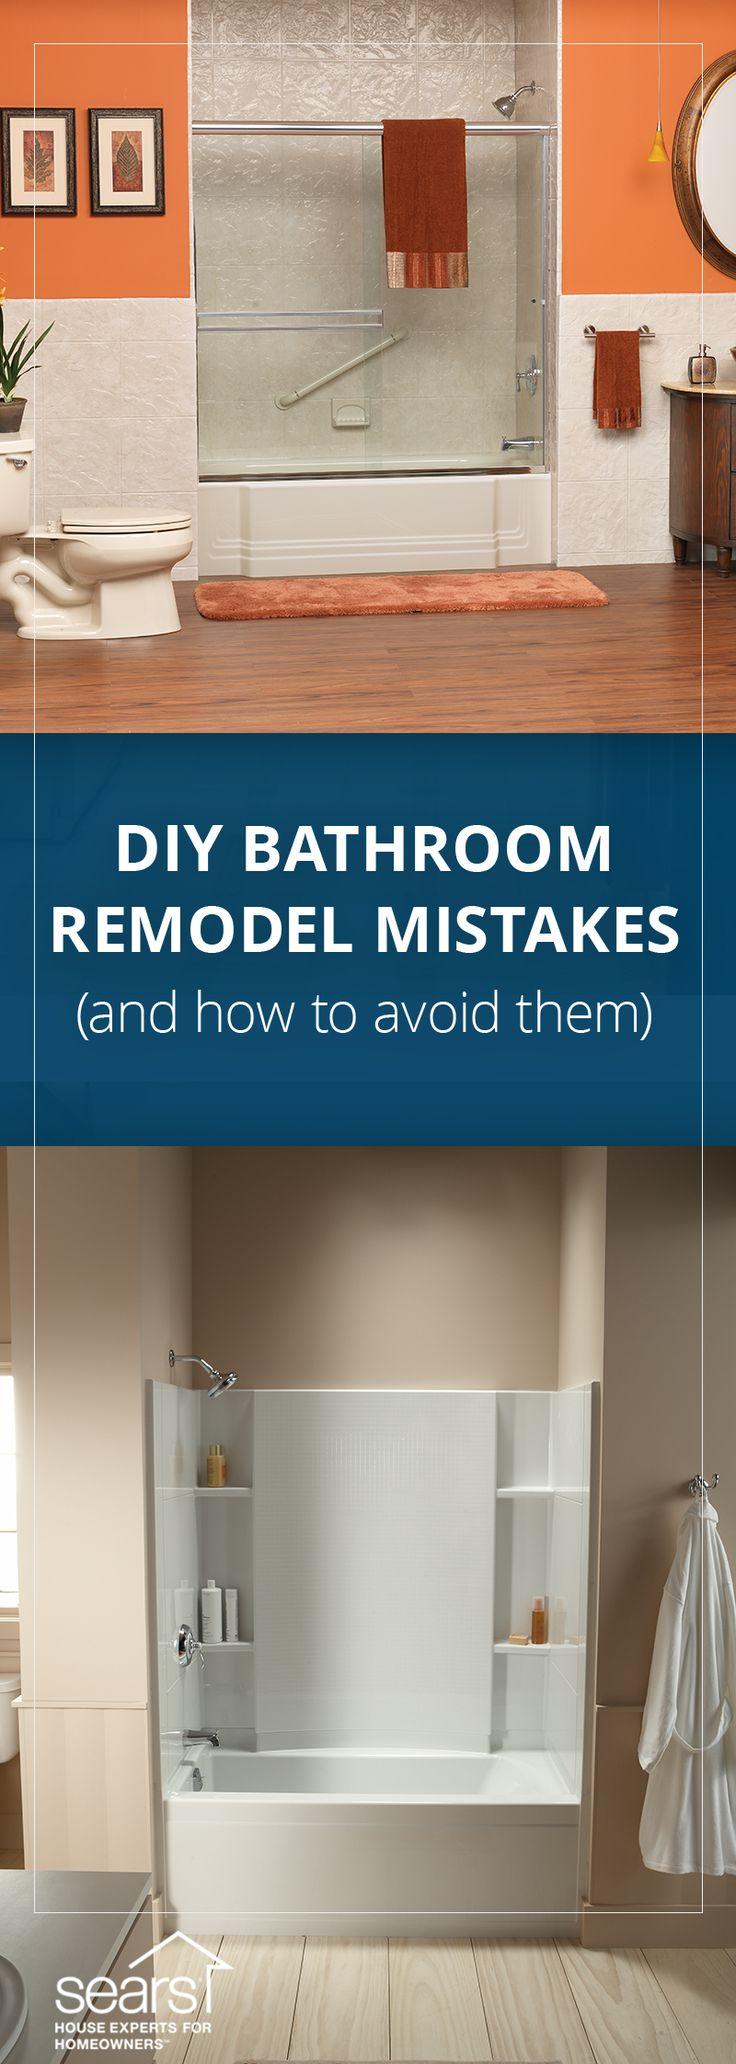 Bathroom Remodel Disaster